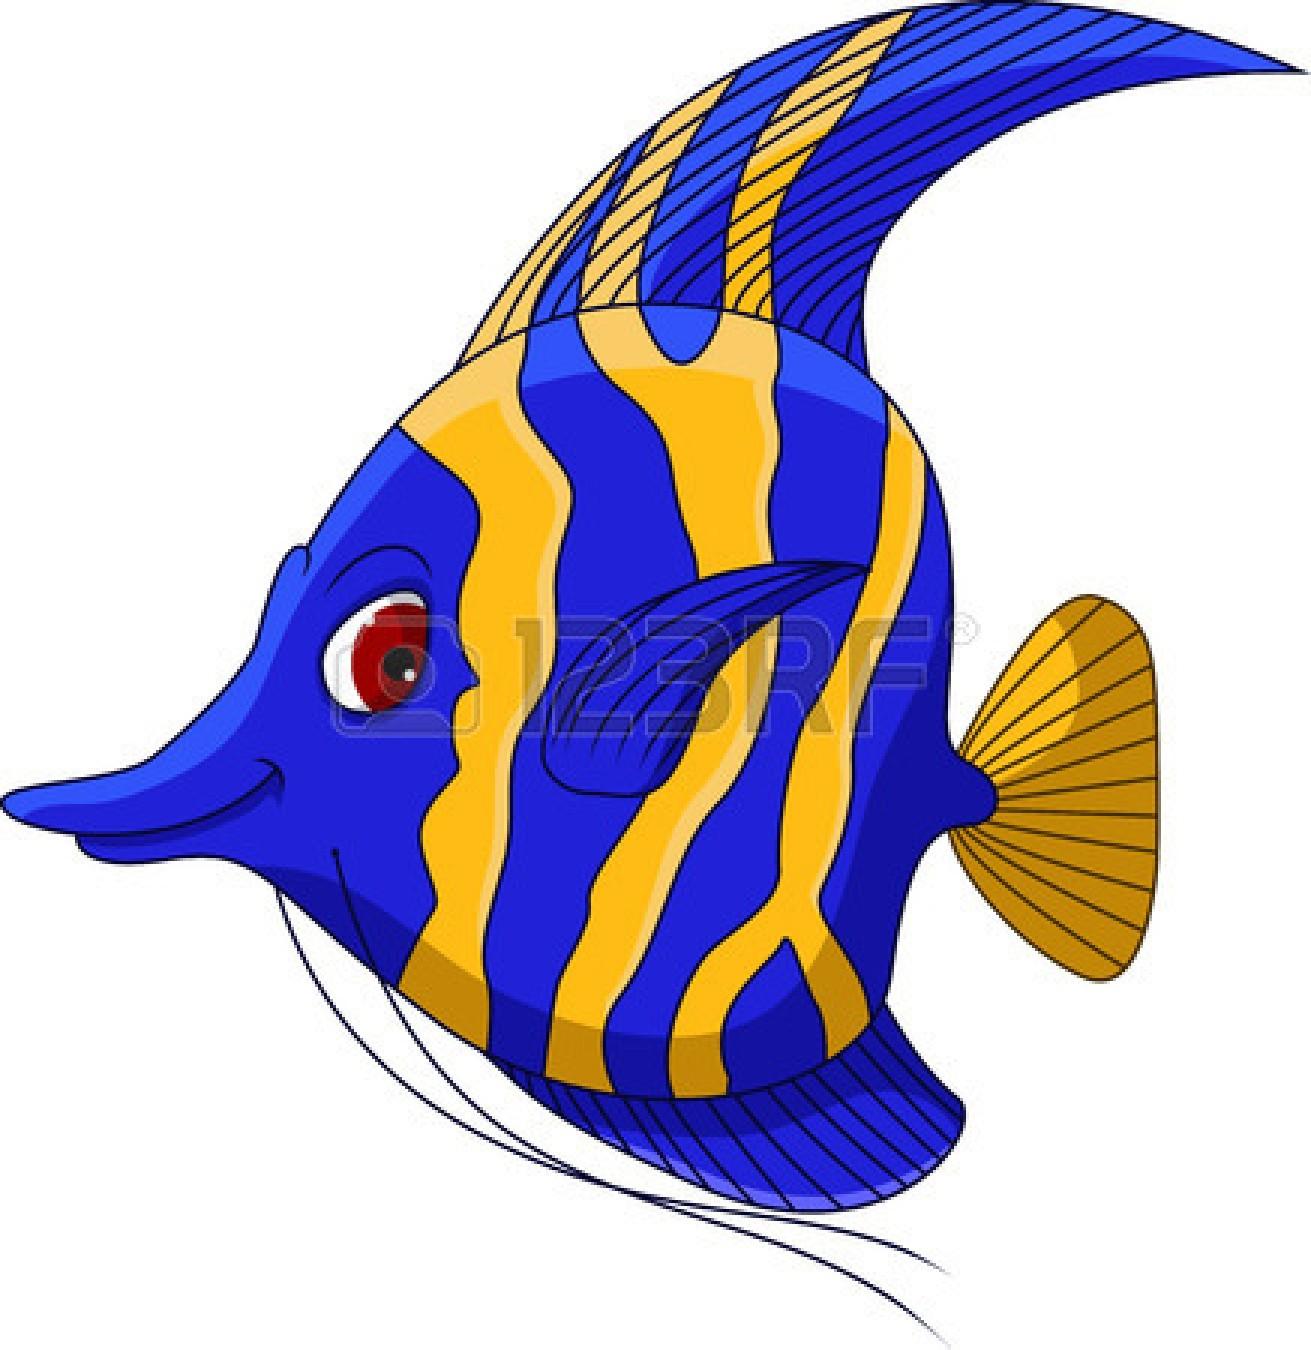 Drawn angelfish cartoon #5 - Angel Fish PNG HD